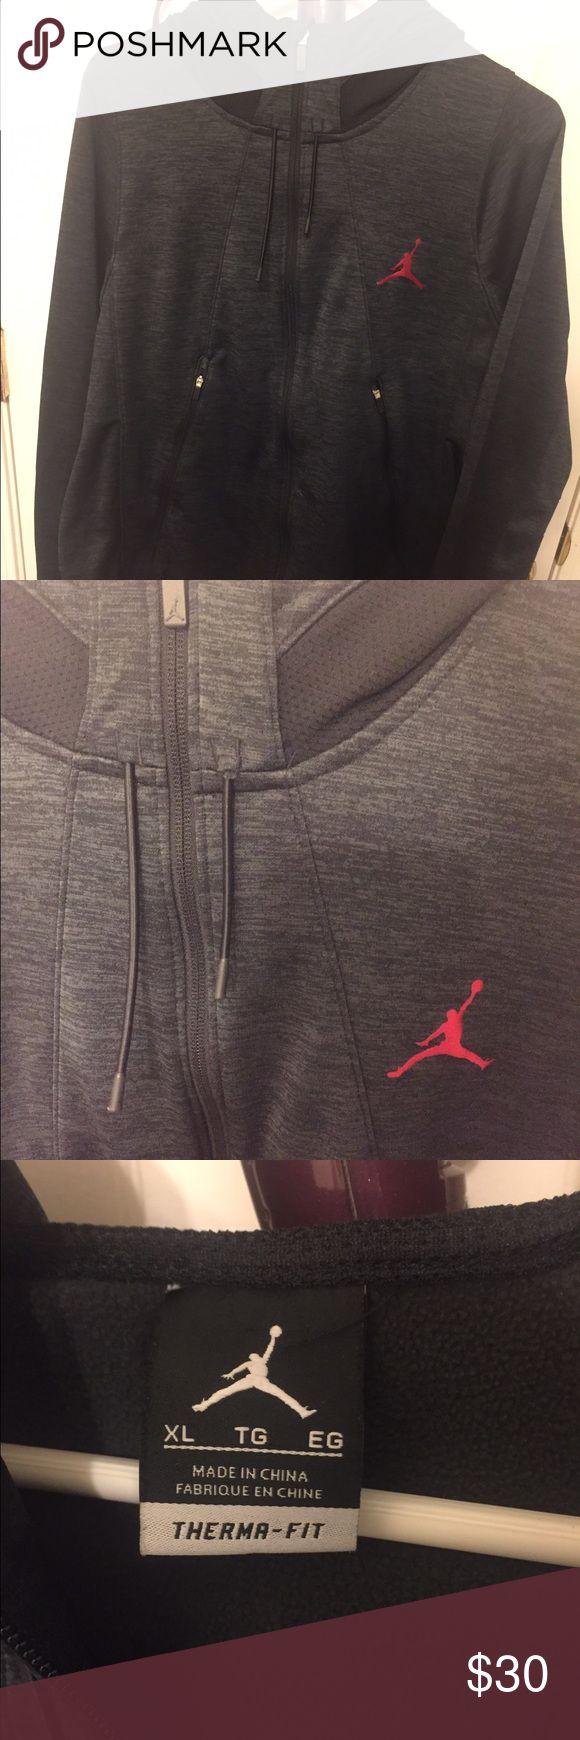 a81f99cf655032 ... velour pants Nike Air Max Wright - Men s Men s Jordan Thermafit jacket  size xl excellent Nike Advance Jogging ...